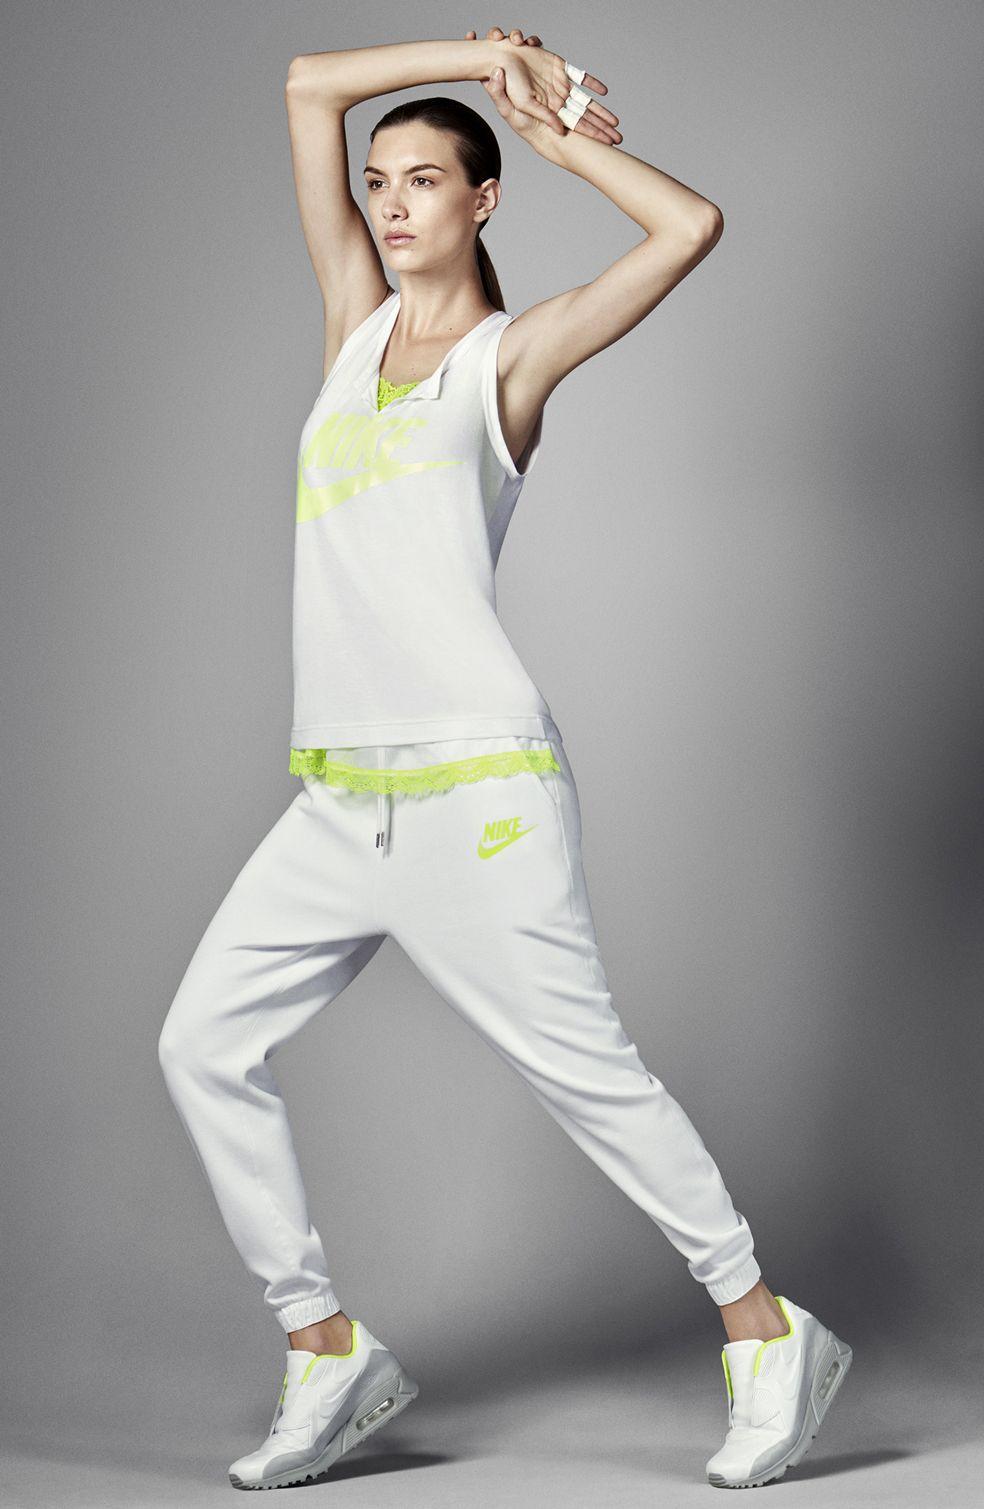 NikeLab x sacai Summer 2015 Collection Lookbook